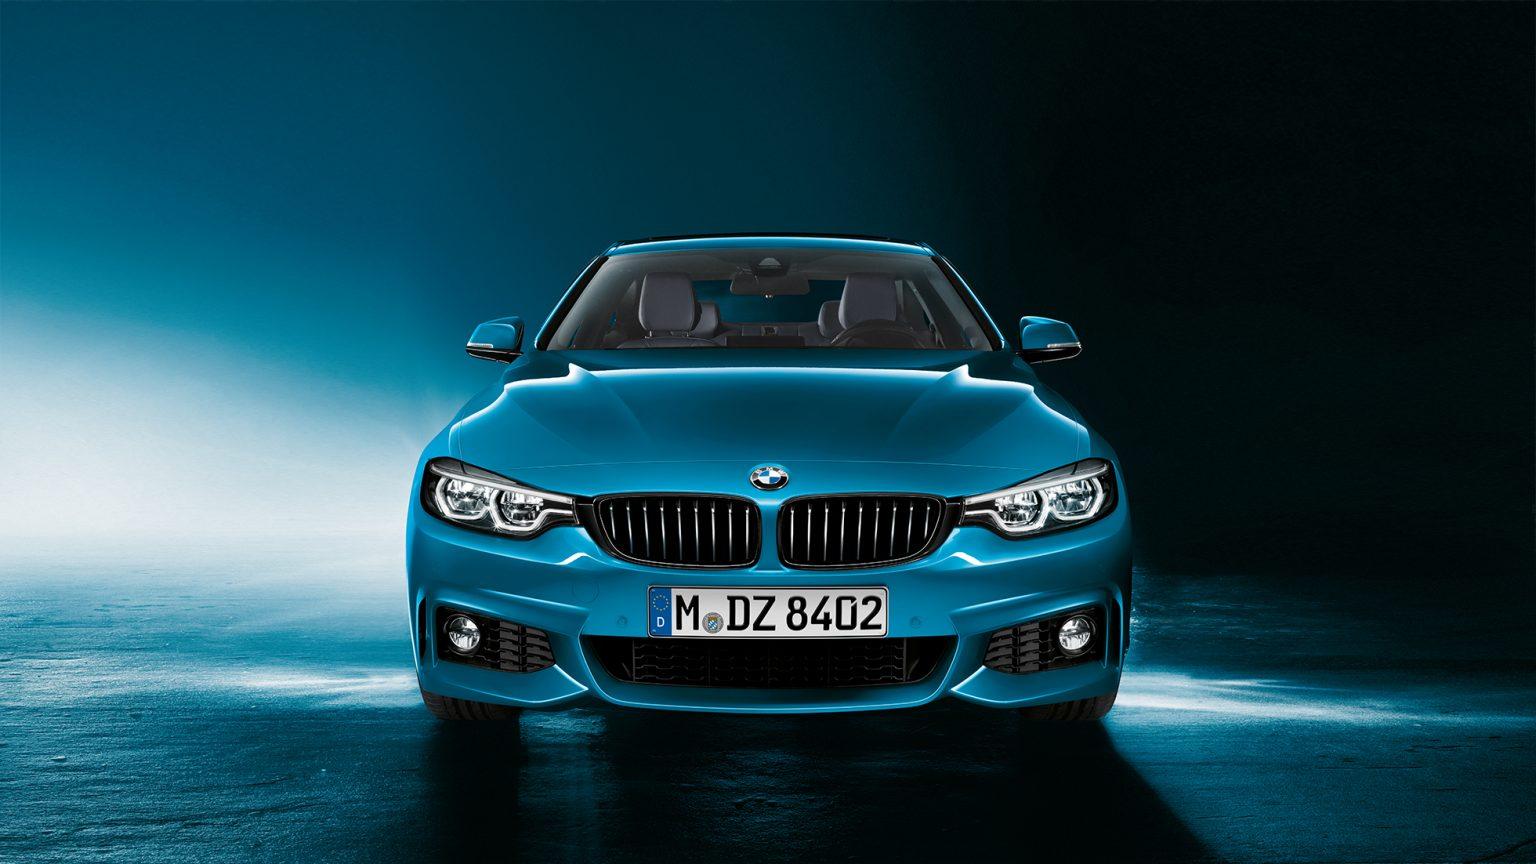 bmw-4-series-coupe-inspire-highlight-desktop-01